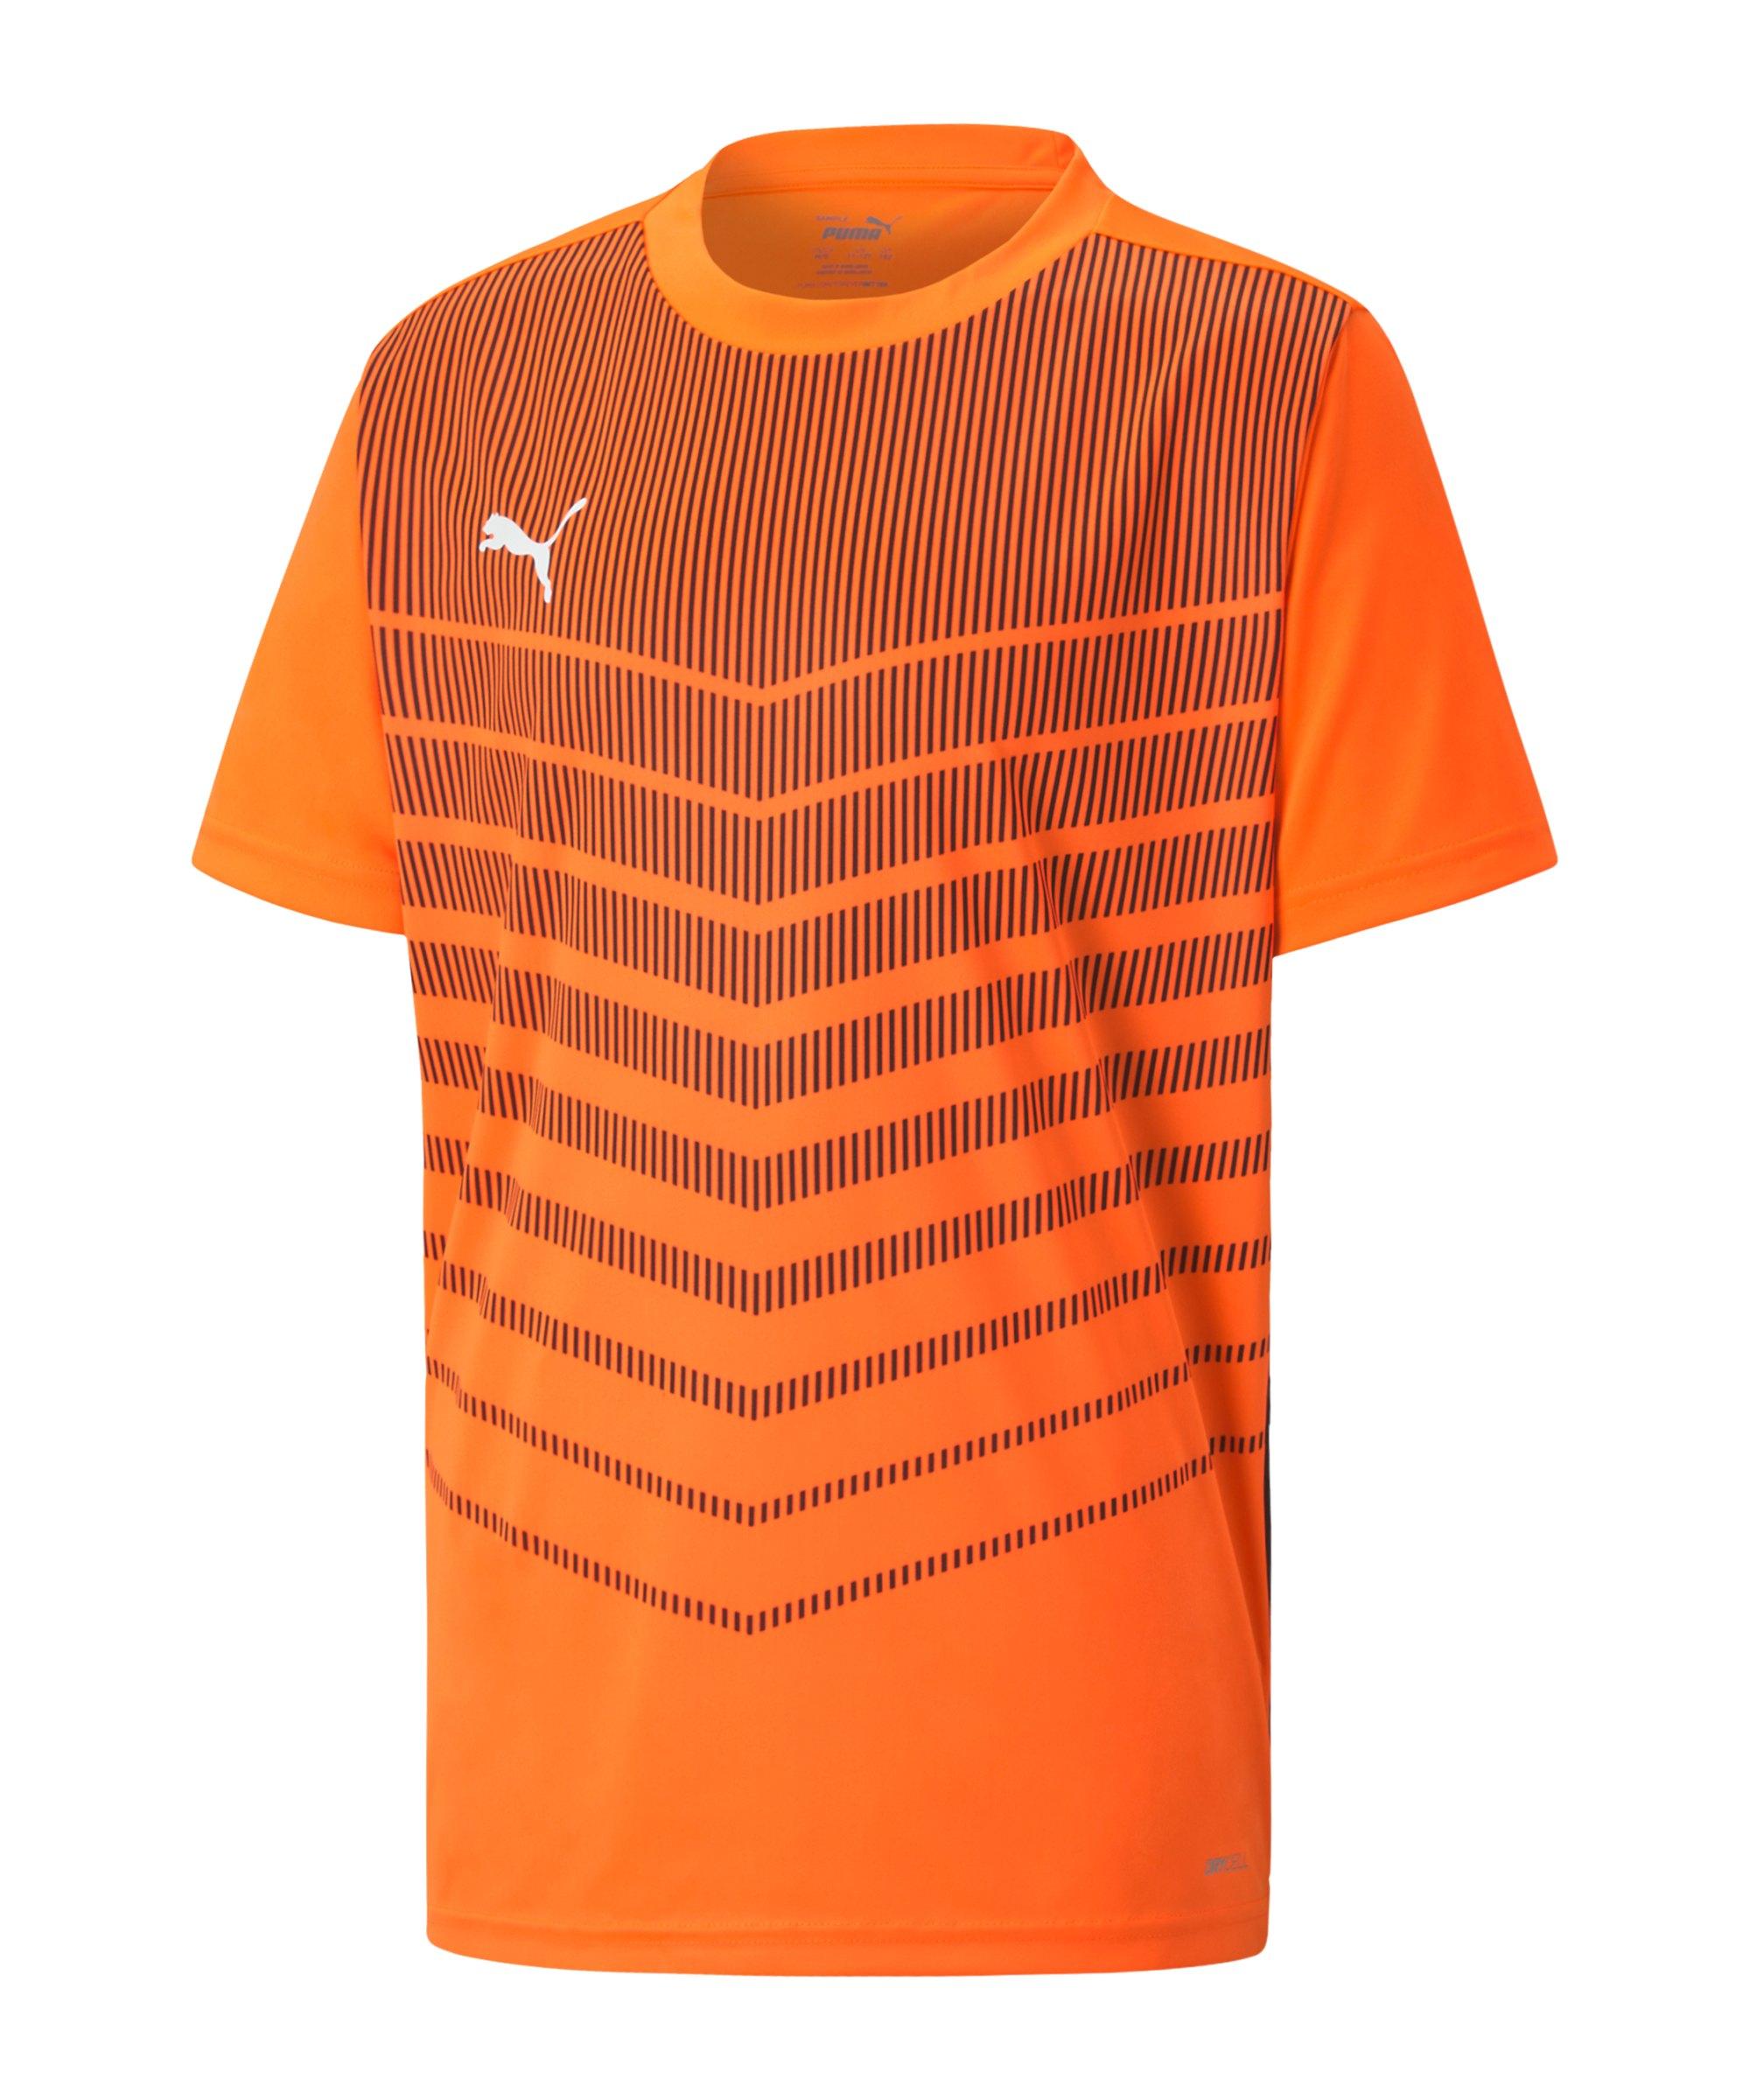 PUMA ftblPLAY Graphic T-Shirt Kids Orange F20 - orange